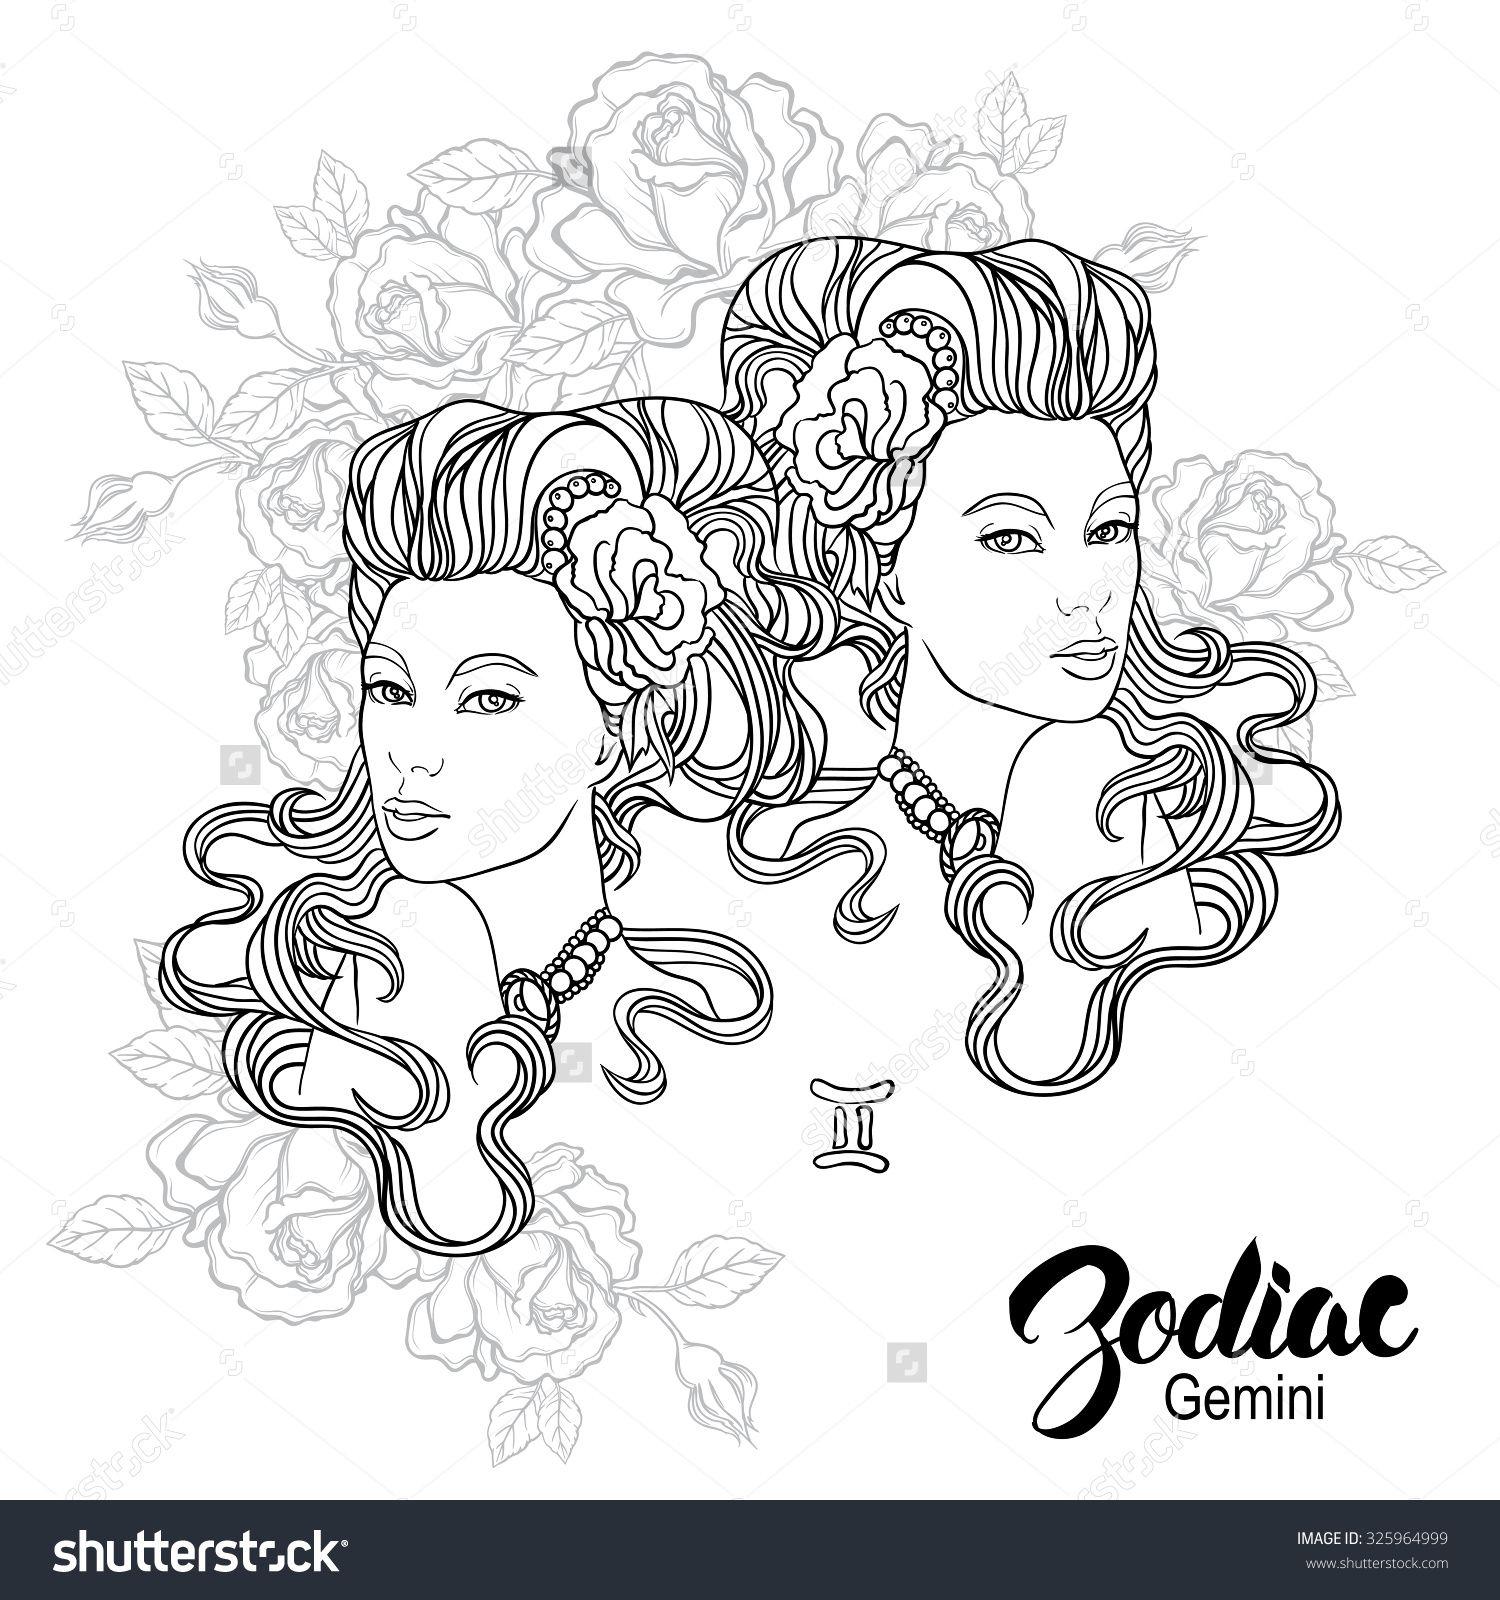 Zodiac Gemini Girl Coloring Book Page